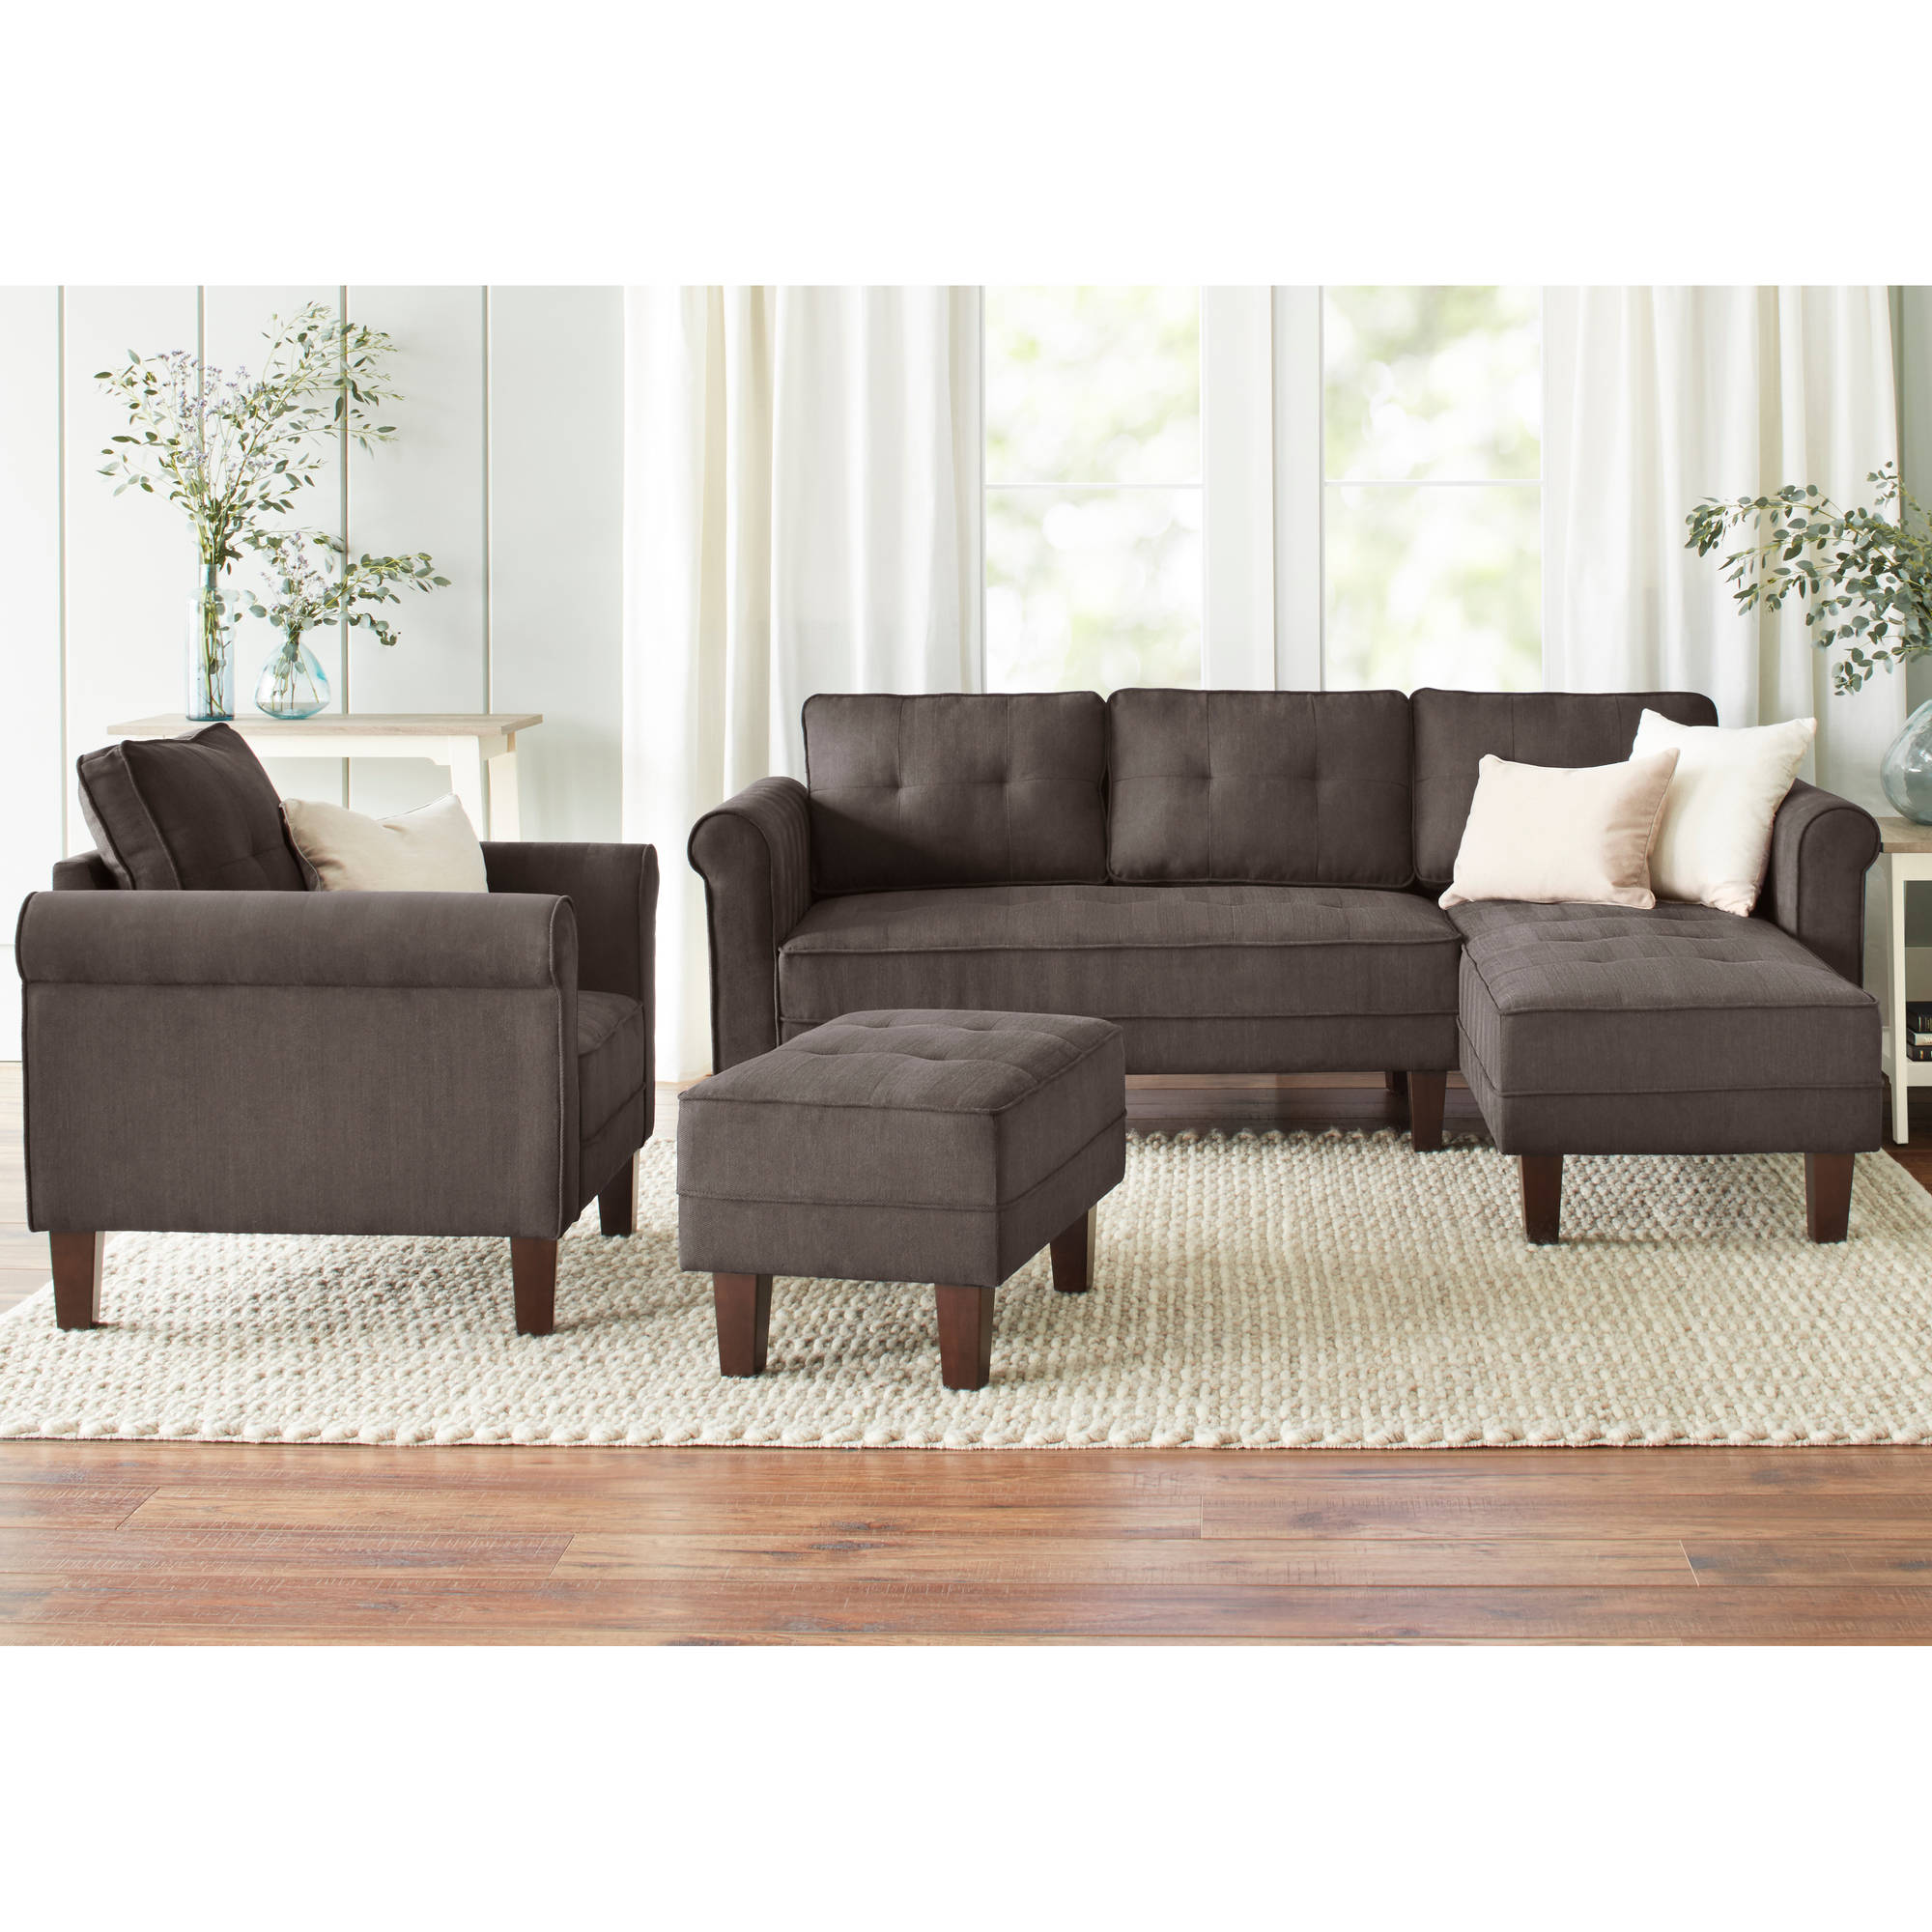 10 spring street ashton microfiber sofa bed color sand for Spring sofa bed